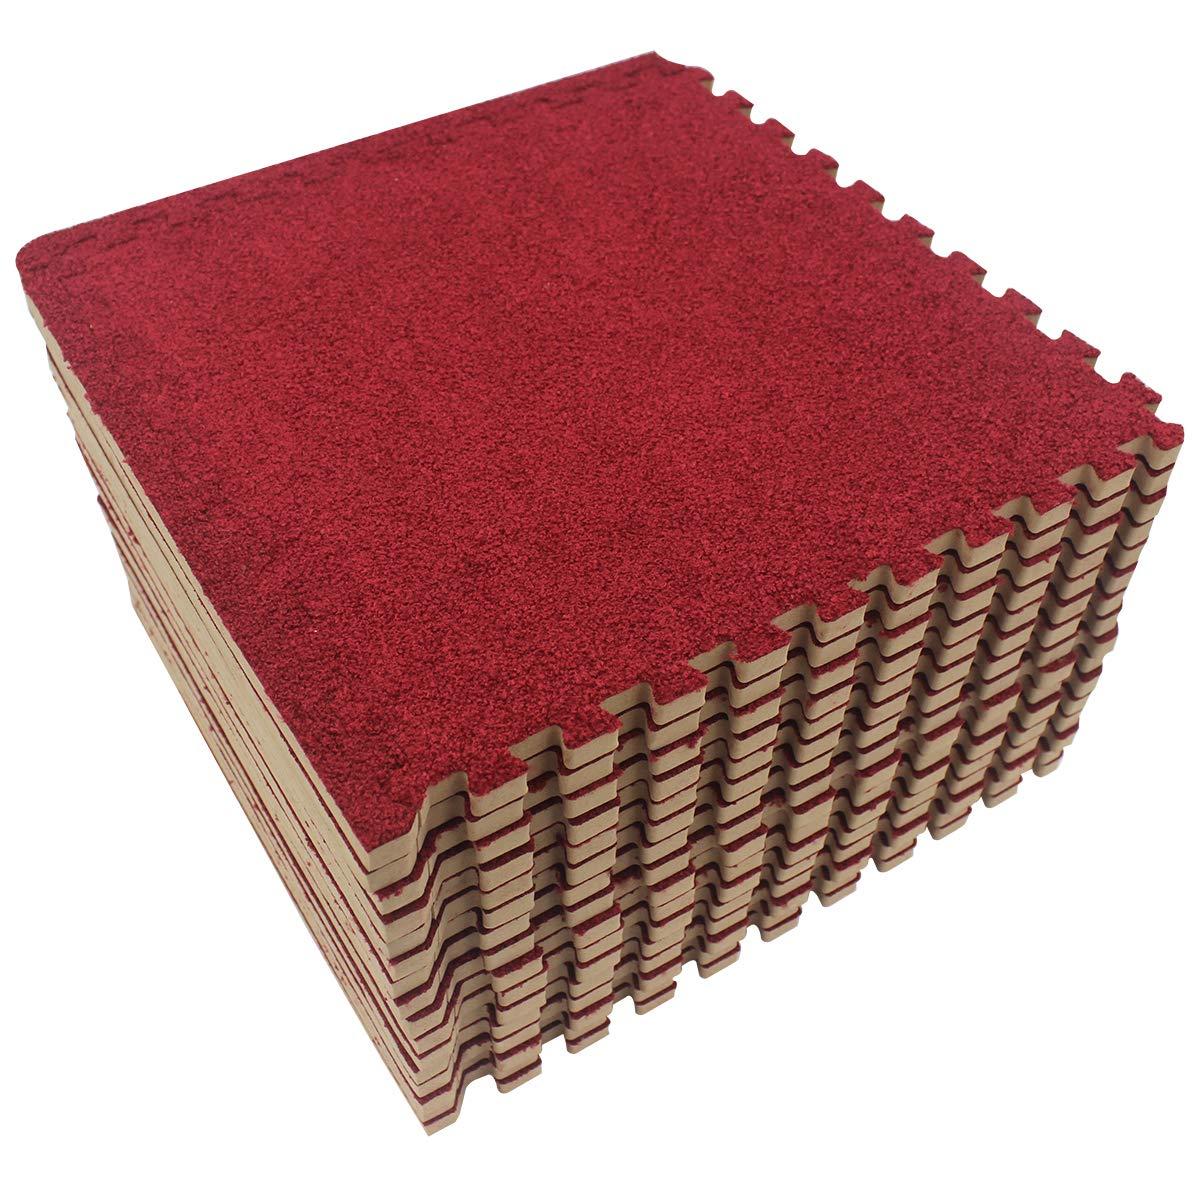 LaFamille Interlocking Foam Floor Mat 16 Tiles 16 sq.ft Puzzle Carpet Flooring Exercise Square Mats Gym,Playroom Floor Mats for Carpet 1'x1' (Burgundy)